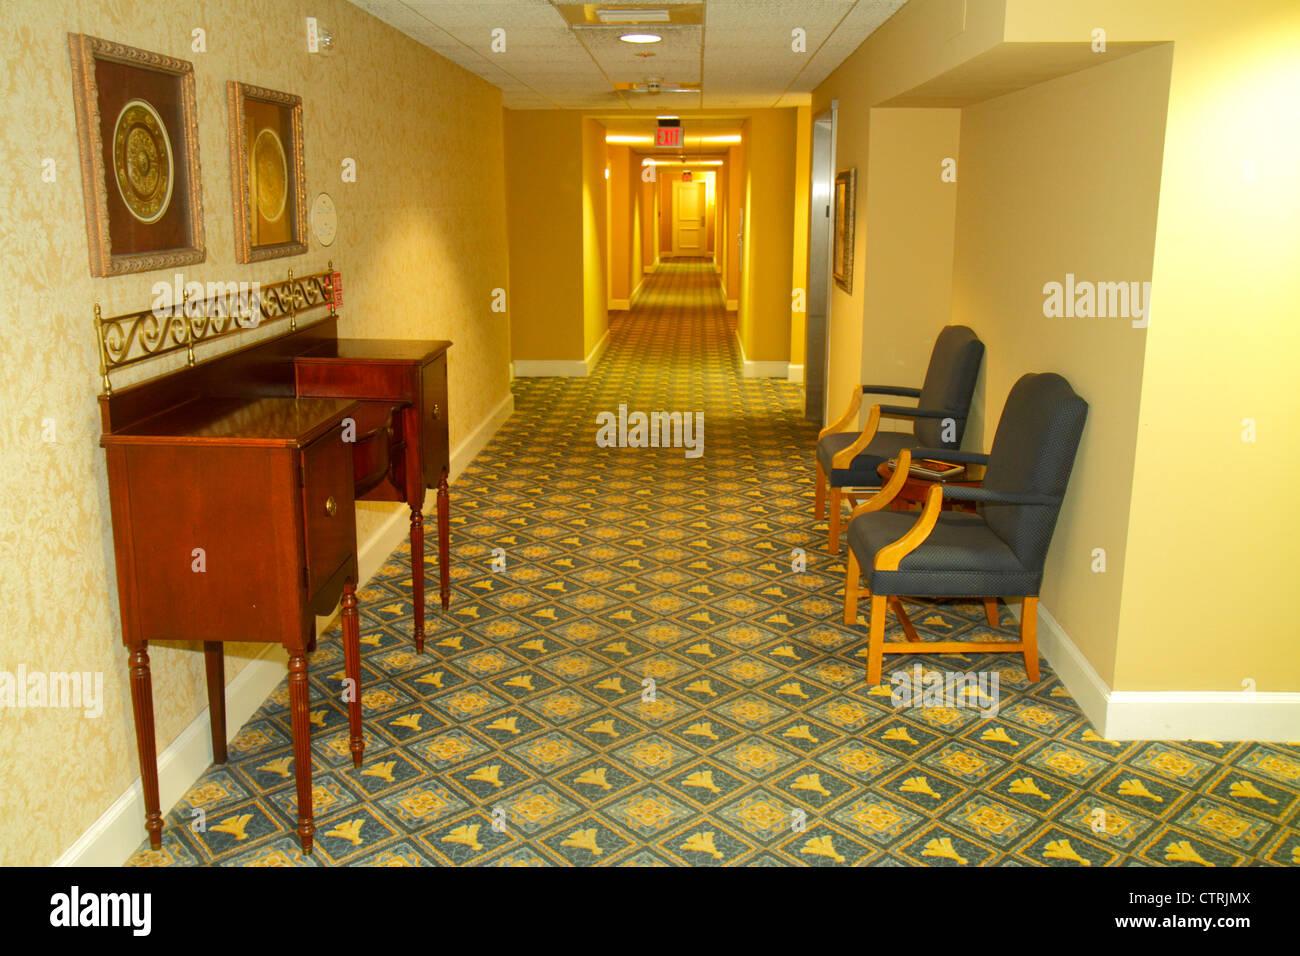 motel hotel hallway stock photos motel hotel hallway stock images rh alamy com Entrance Furniture Entryway Hallway Furniture